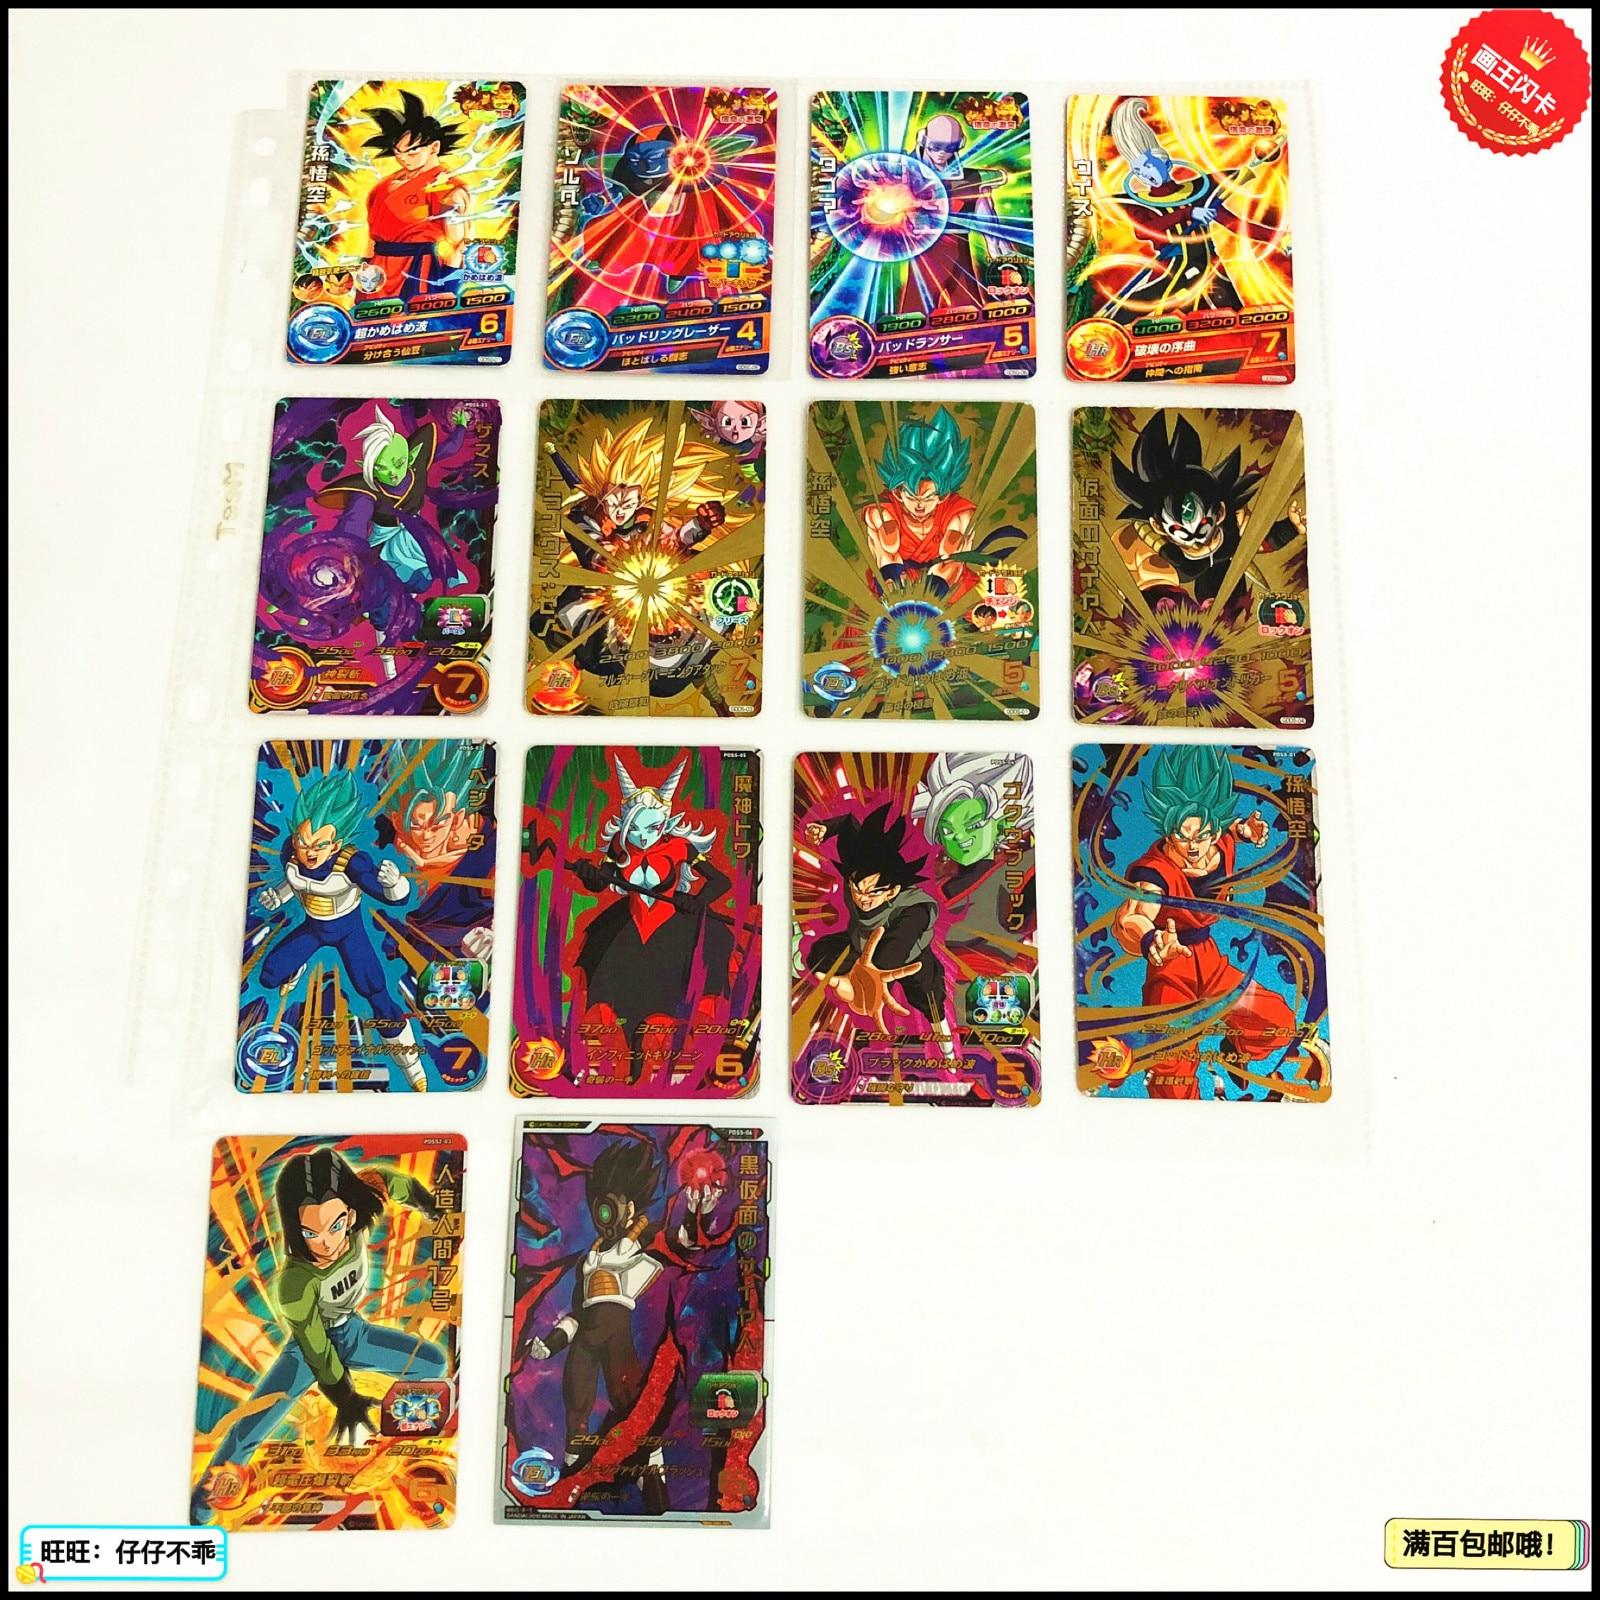 Japan Original Dragon Ball Hero Card GDDS PDSS GDSG Goku Toys Hobbies Collectibles Game Collection Anime Cards